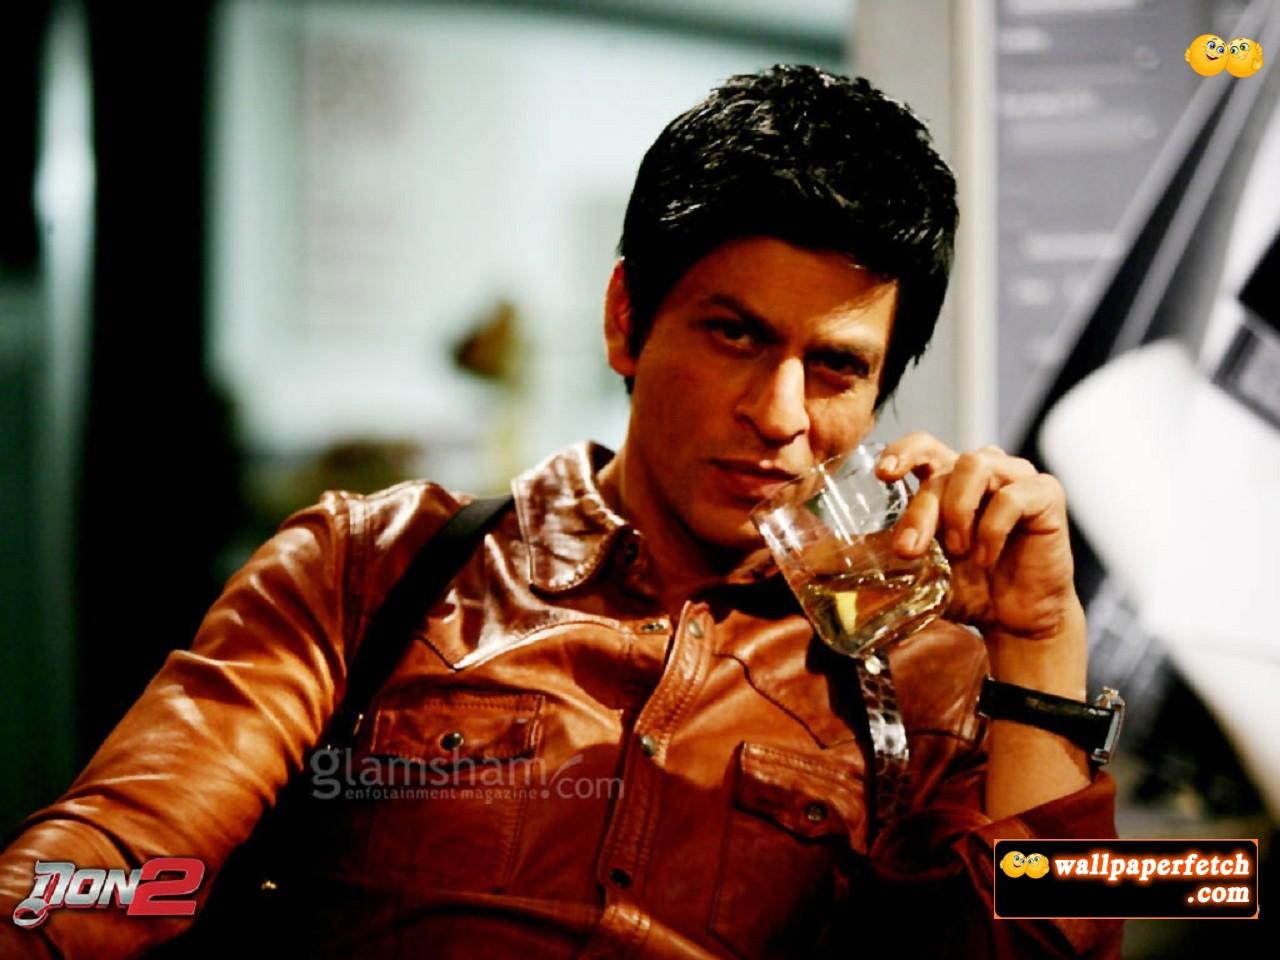 Wallpaper Fetch: Shahrukh Khan Wallpapers 2012